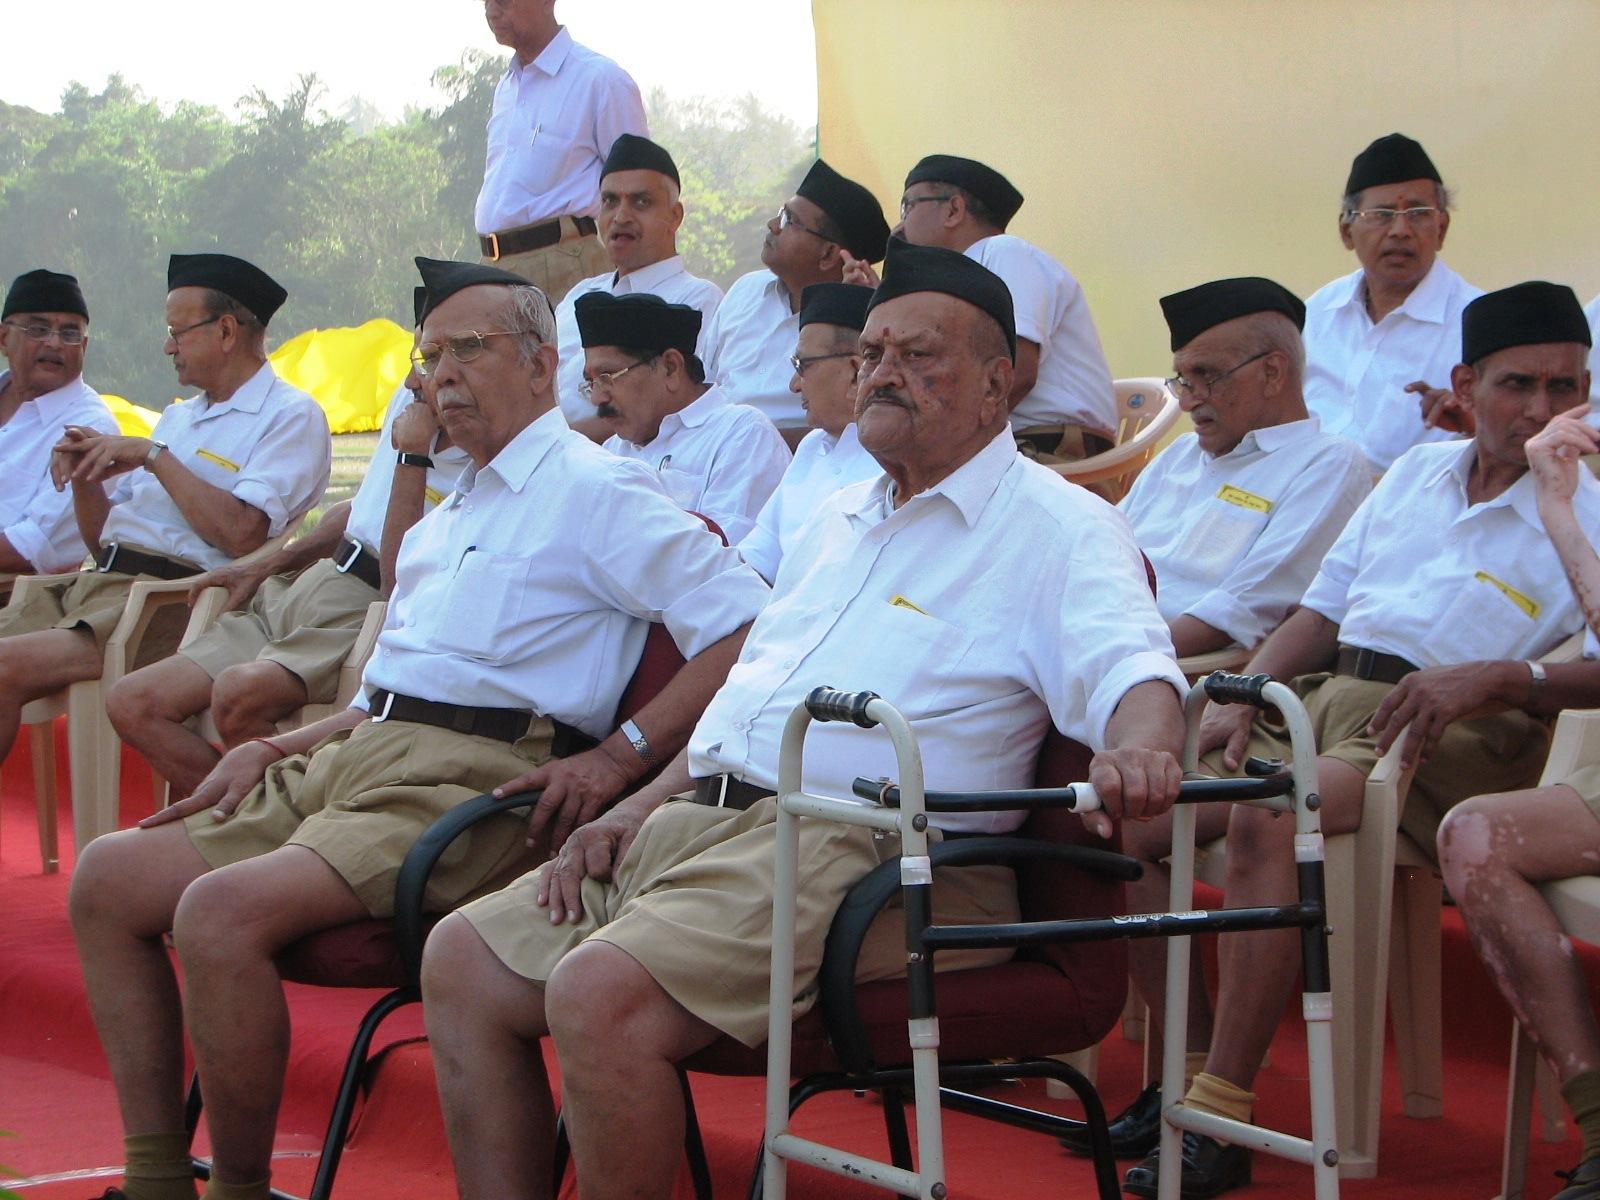 K Suryanarayan Rao at Mangaluru Vibhag Sanghik-2013